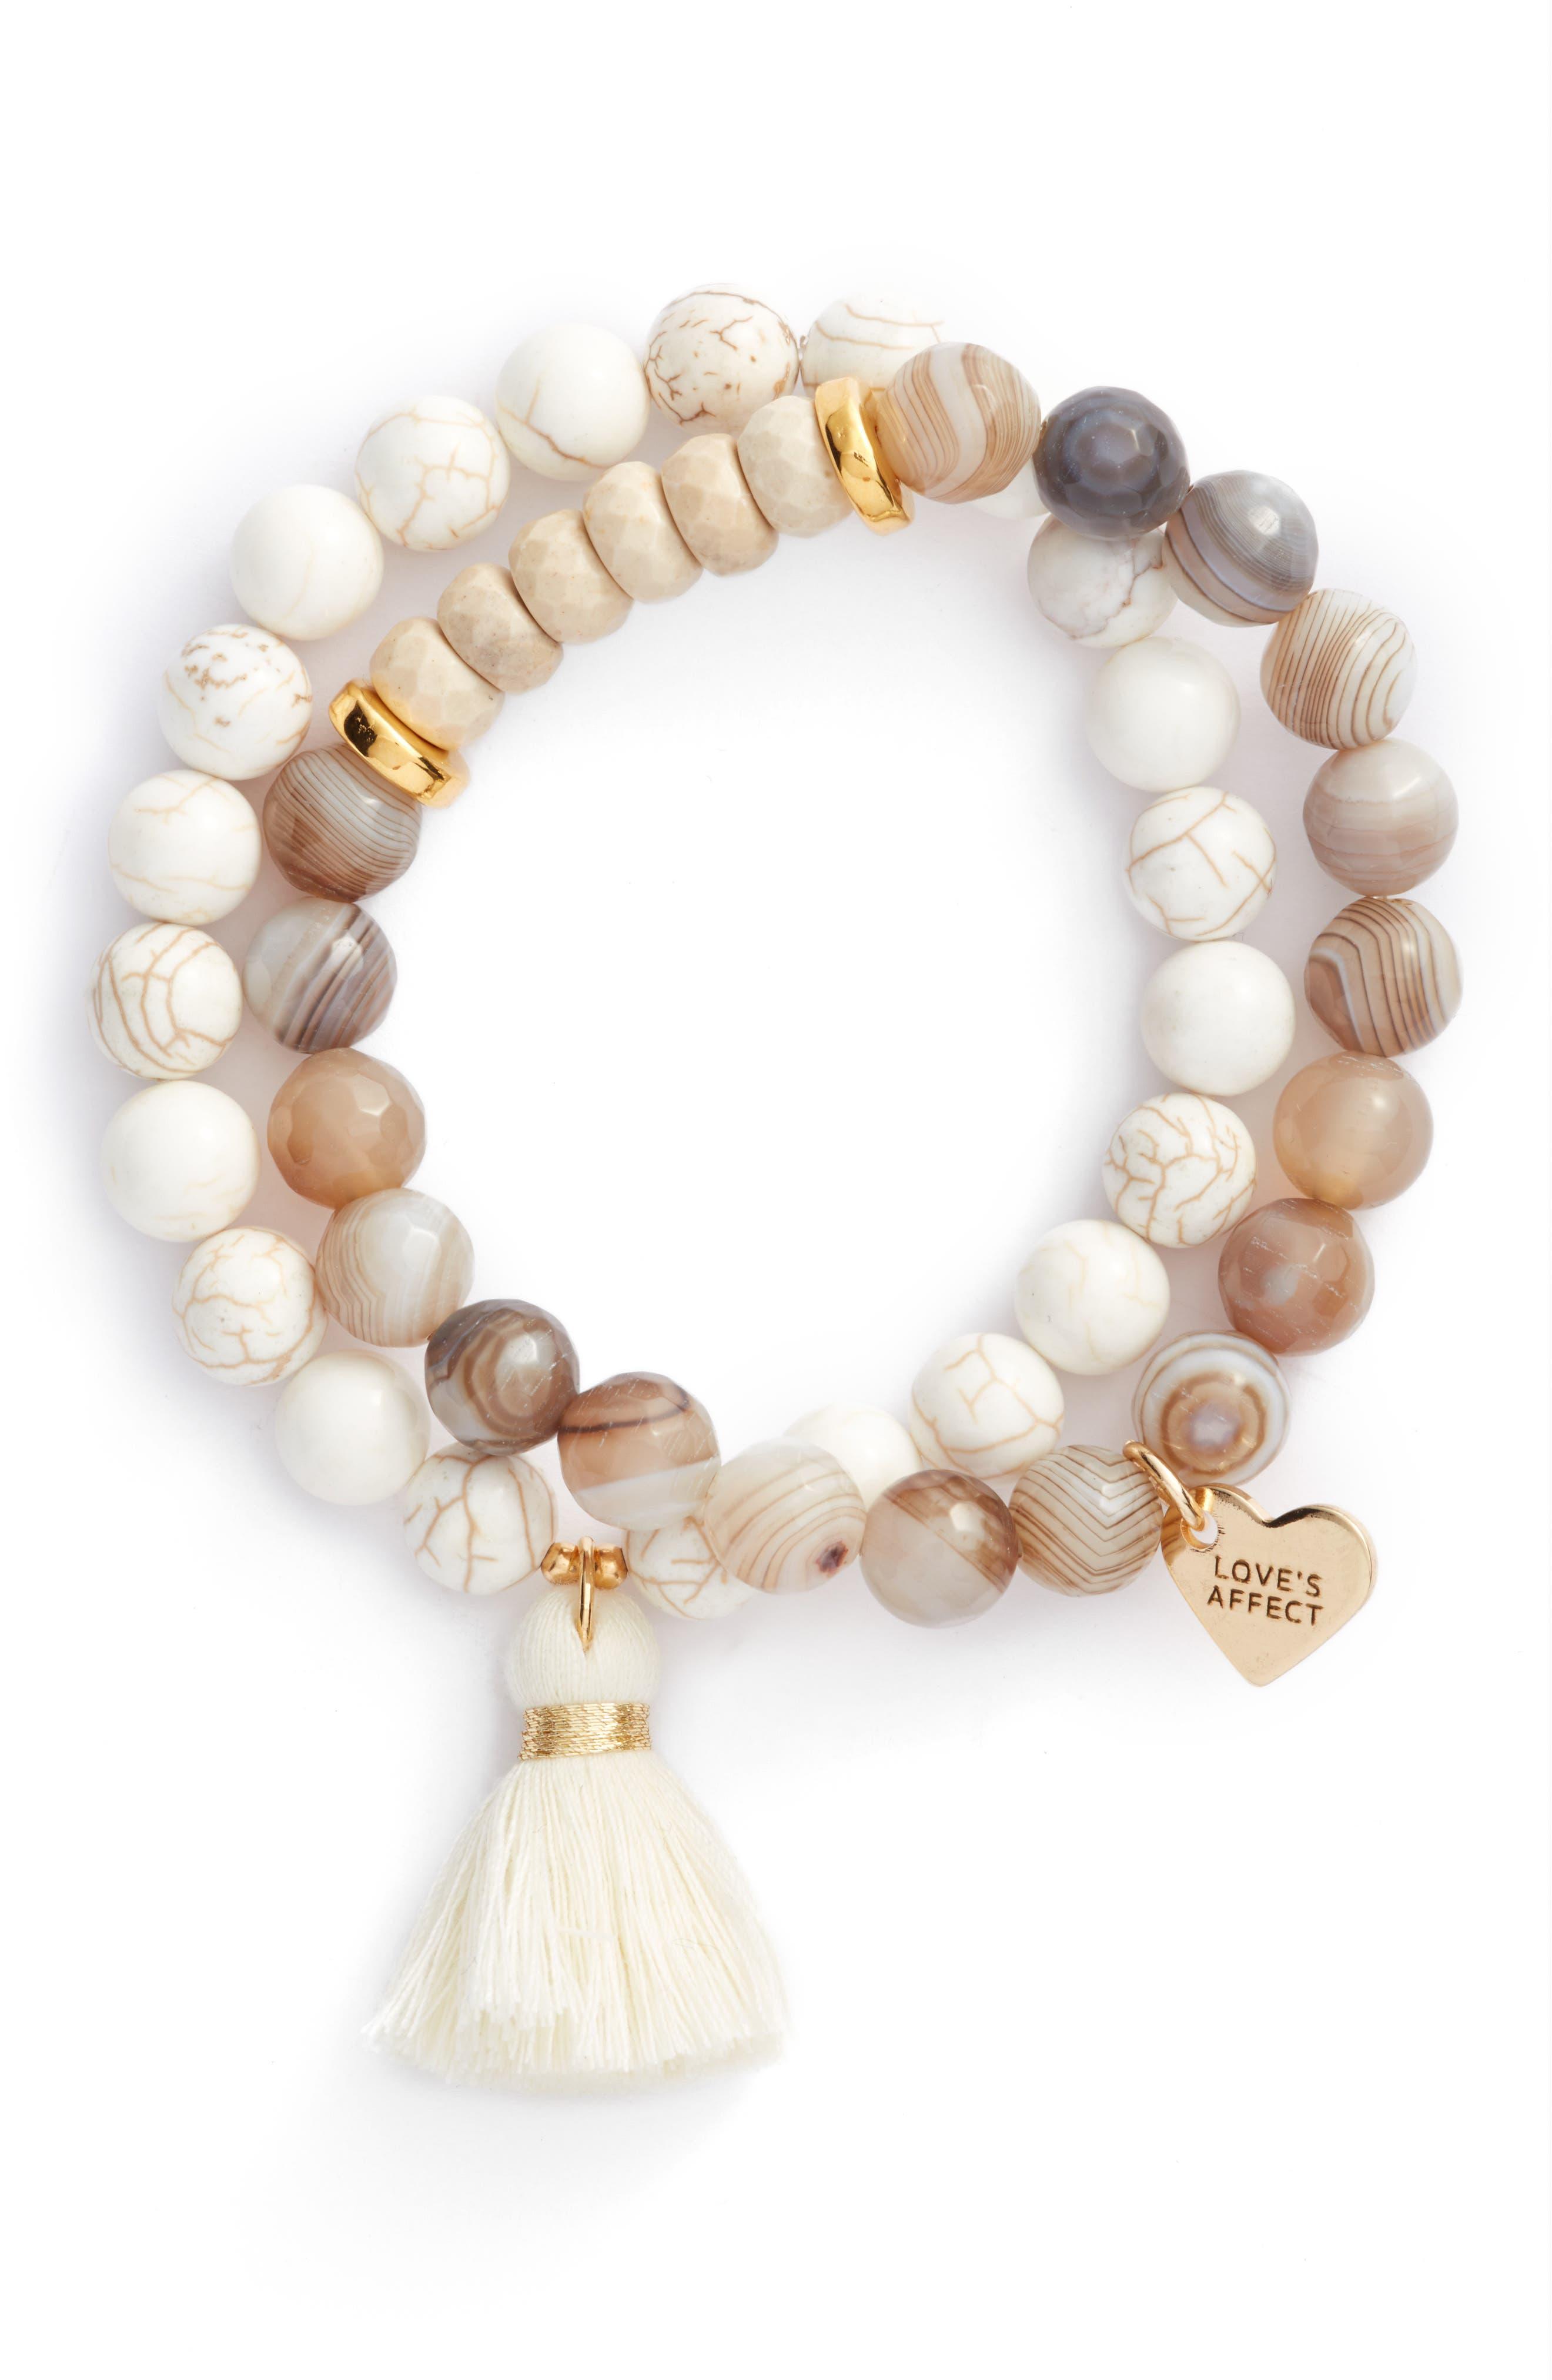 Main Image - Love's Affect Set of 2 Semiprecious Stone Tassel Bracelets